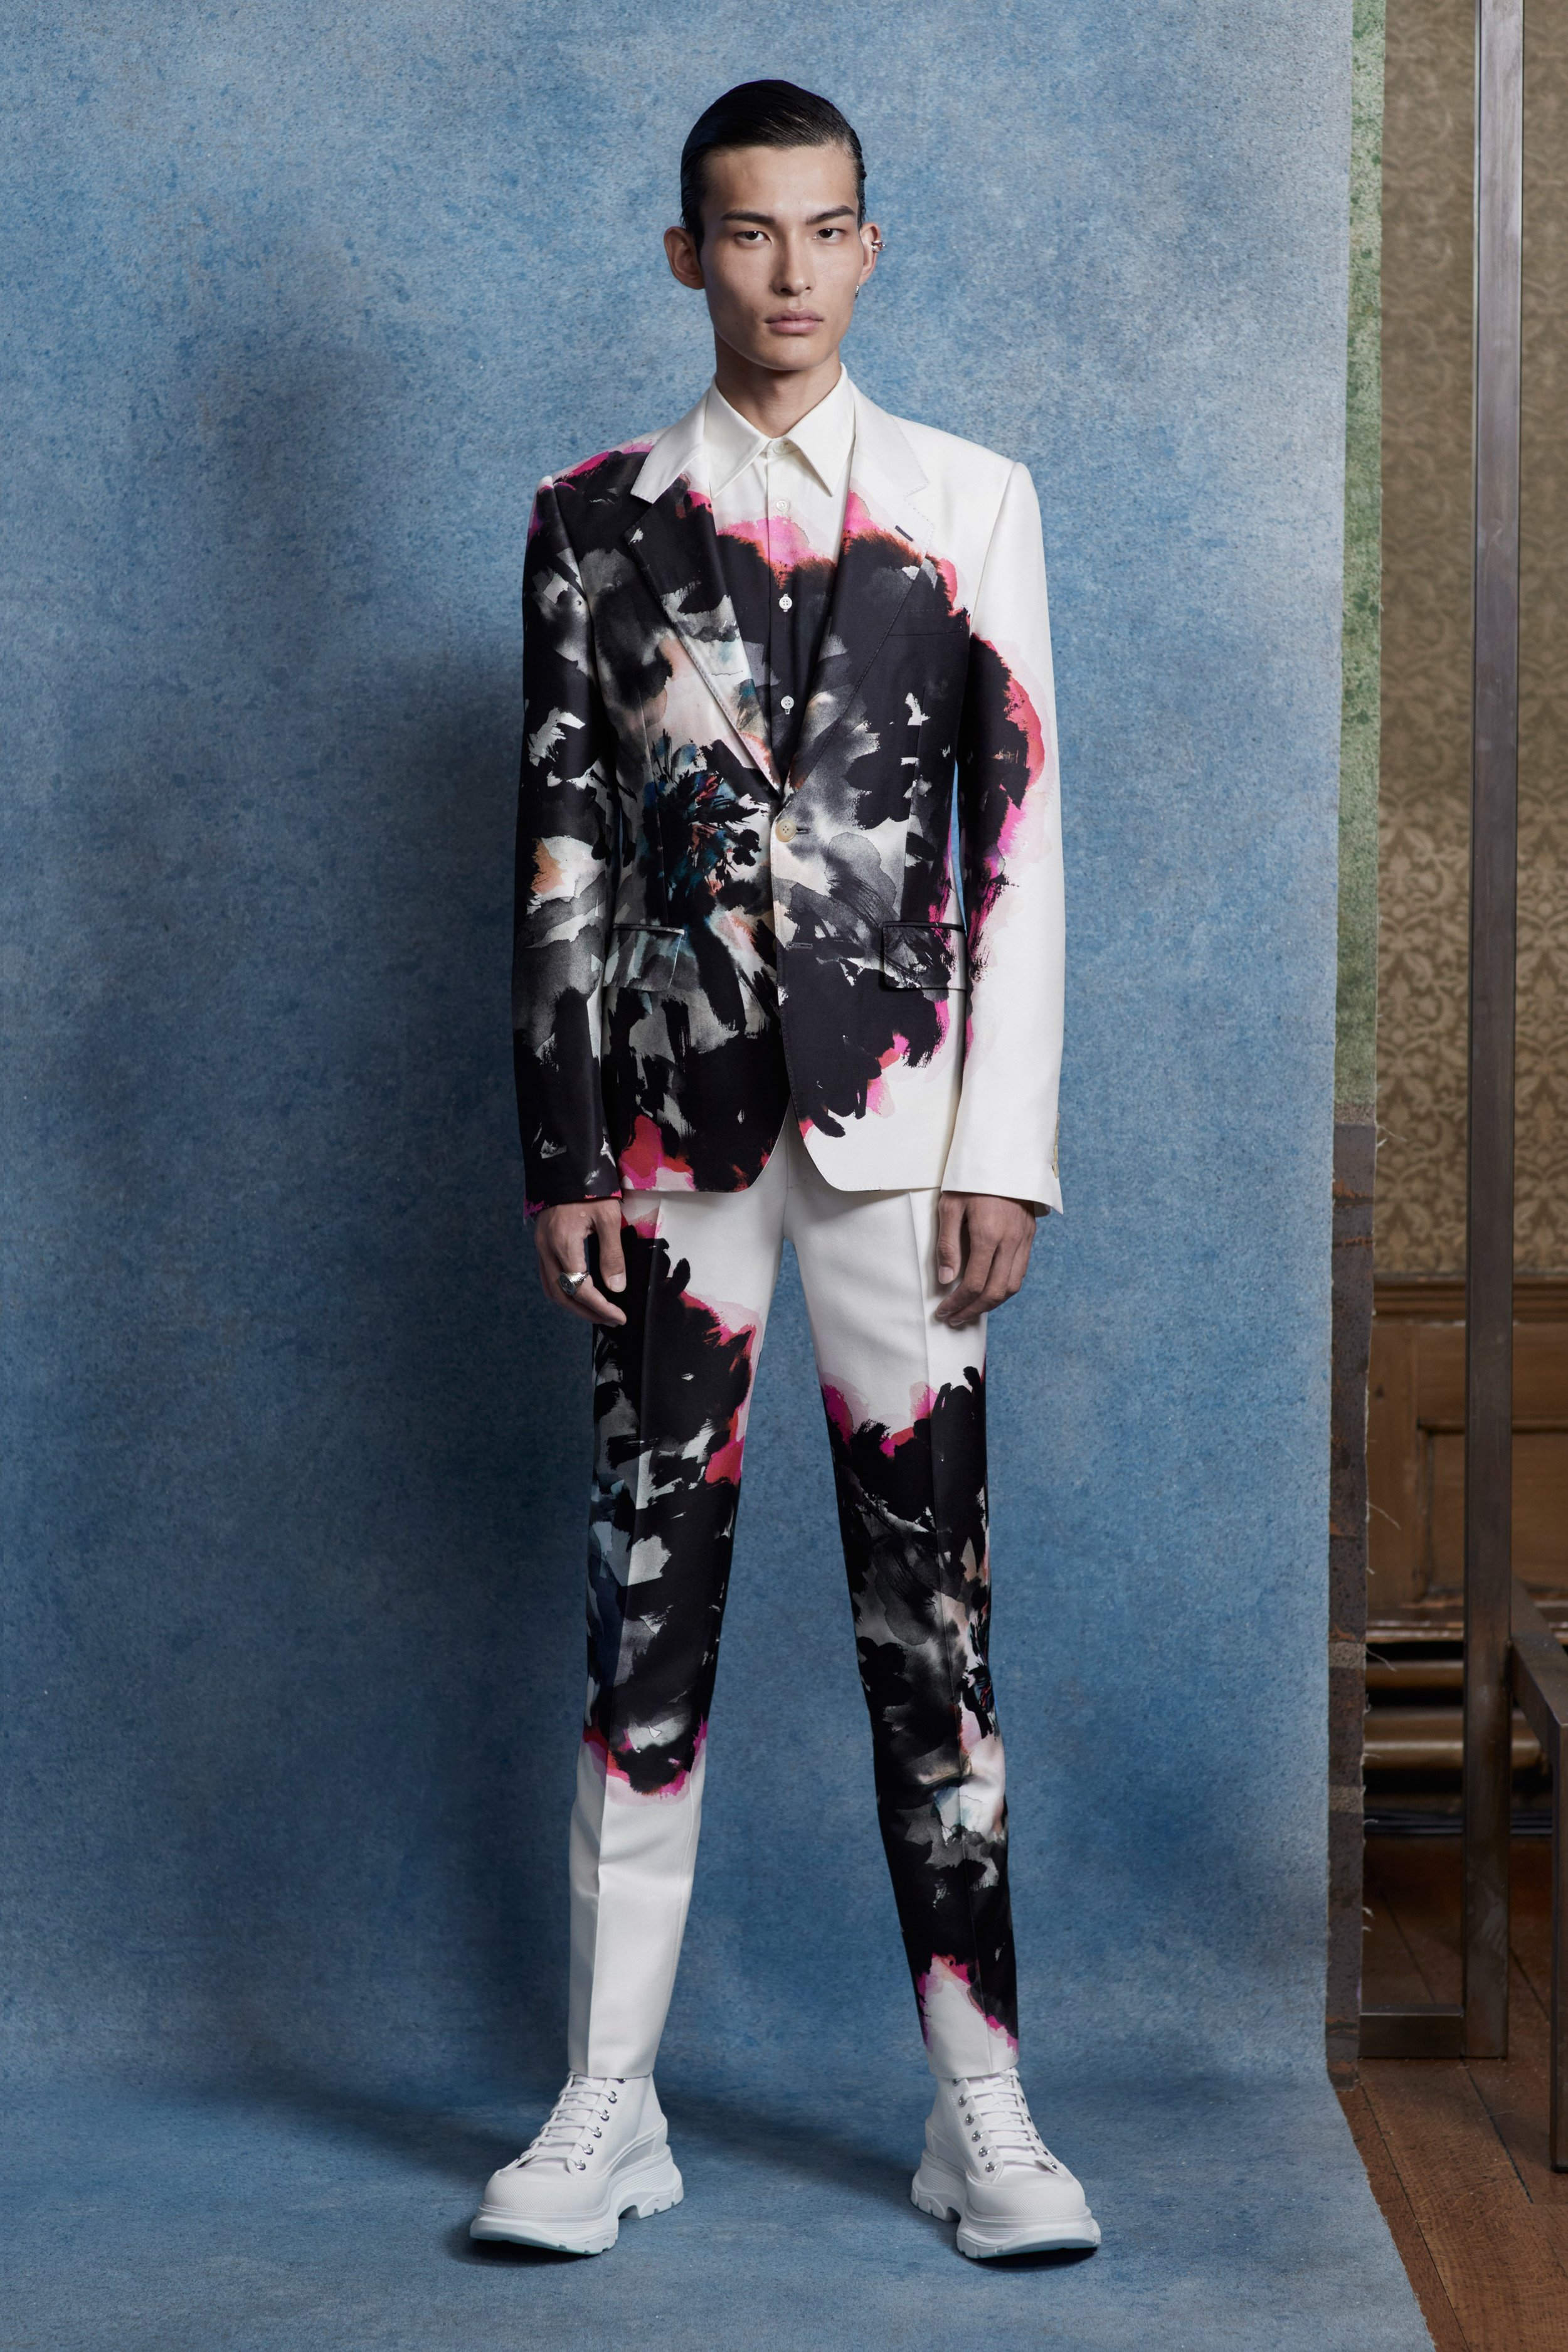 00004-alexander-mcqueen-menswear-spring-20-credit-Ethan-James-Green.jpg